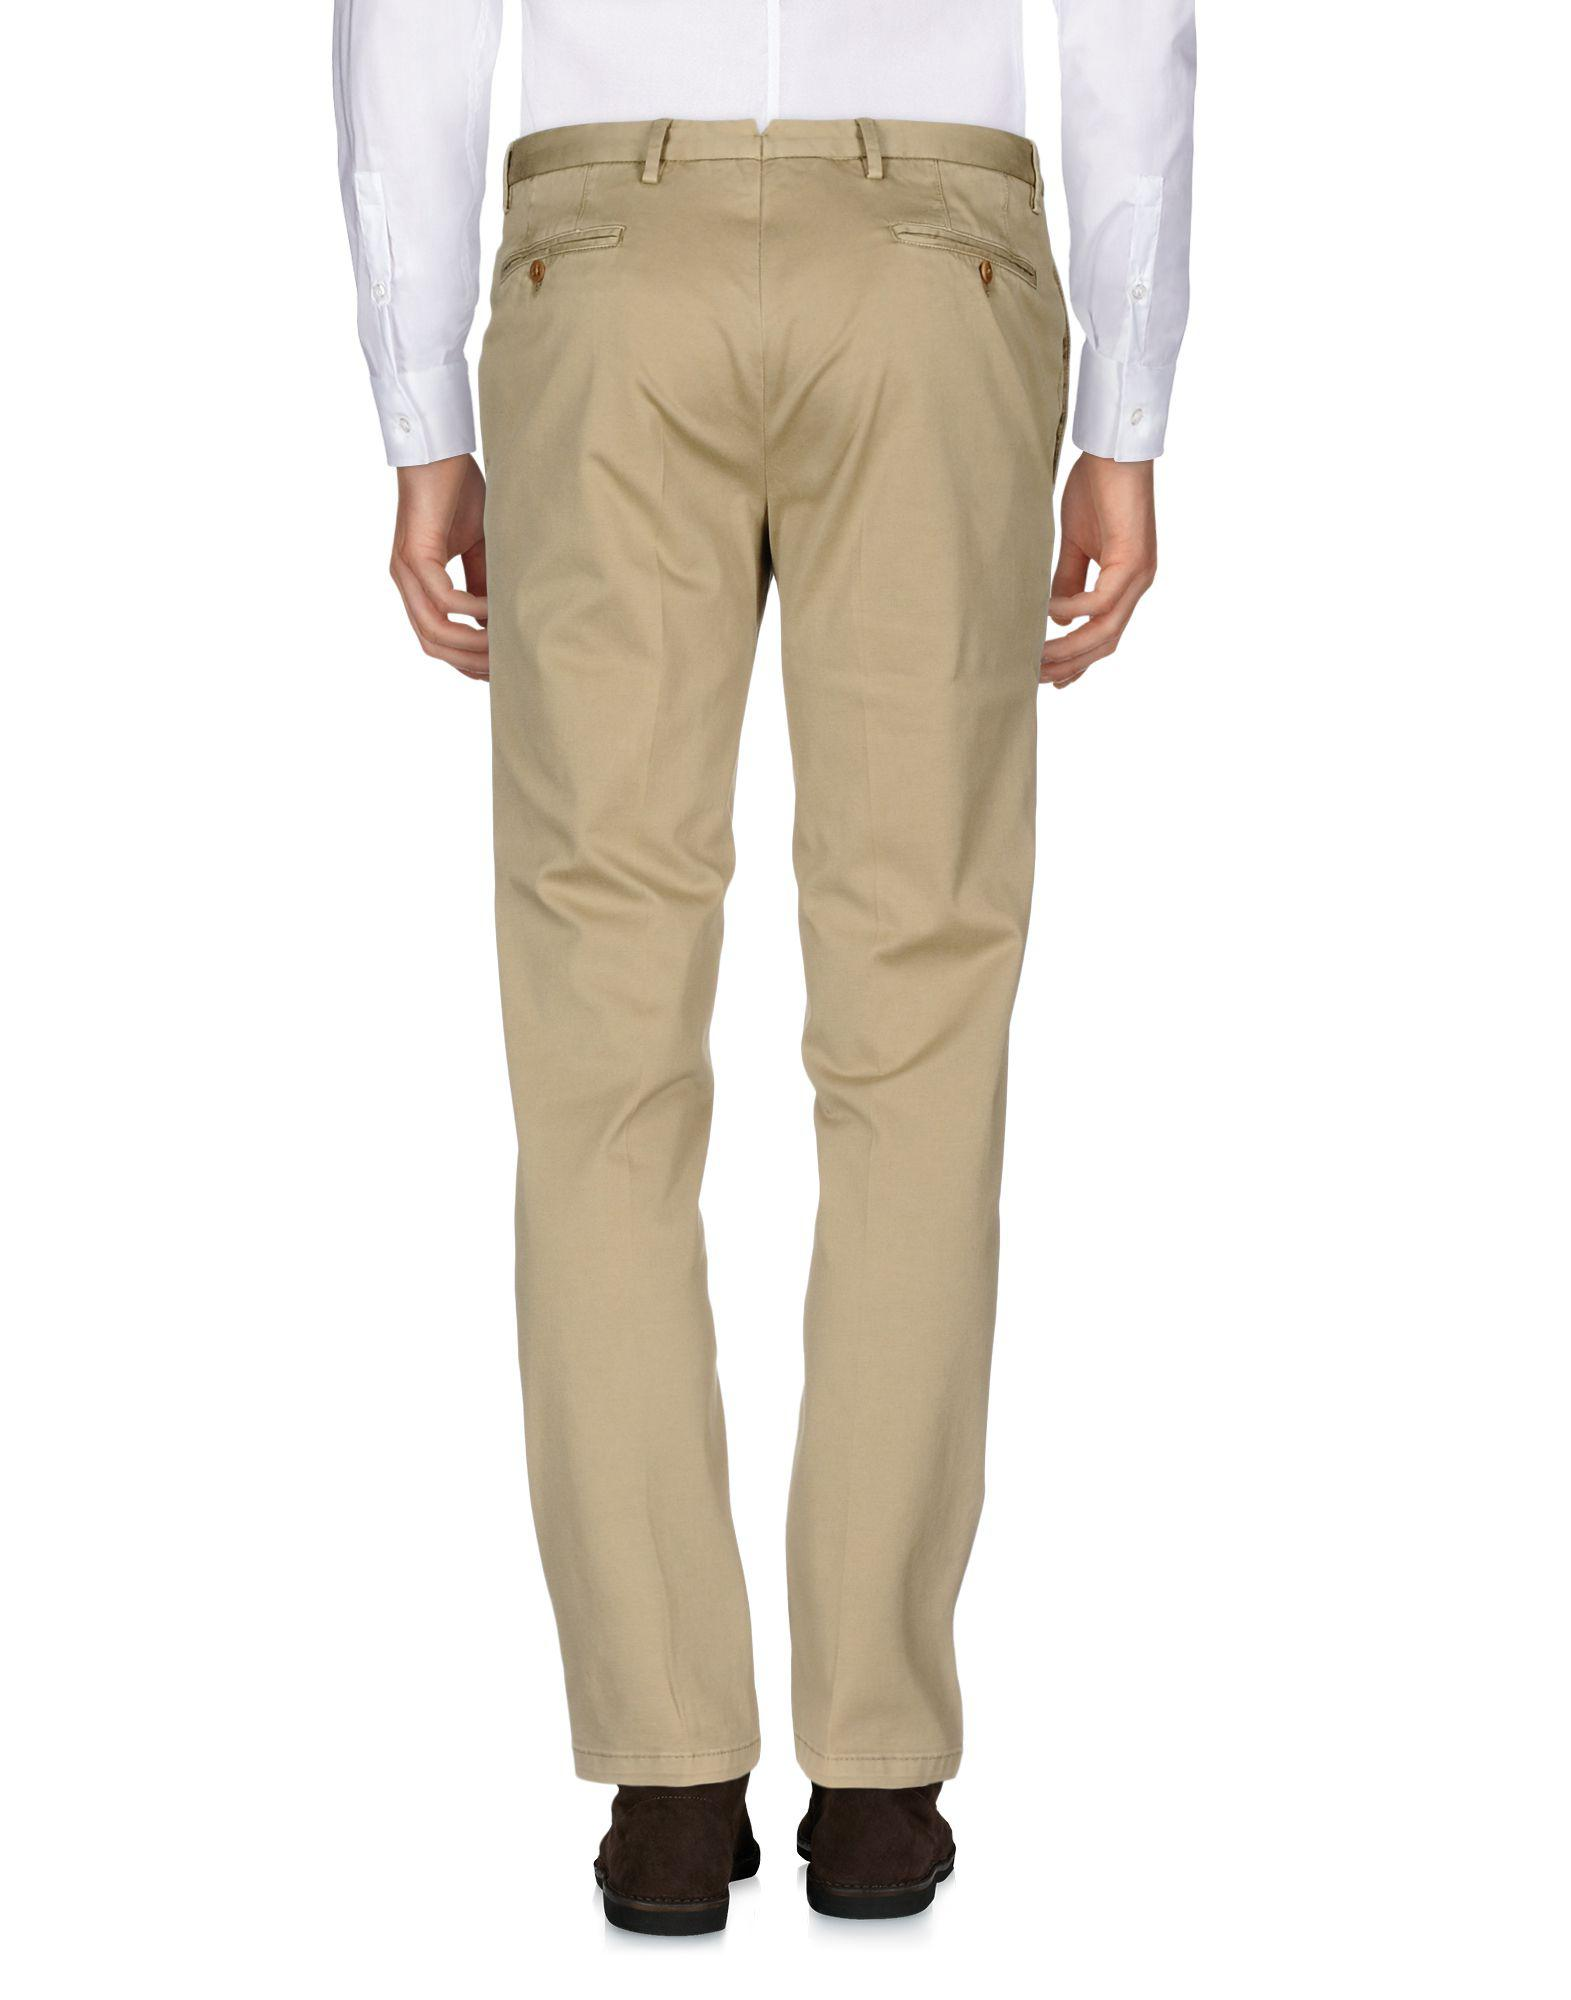 Boglioli Cotton Casual Pants in Beige (Natural) for Men